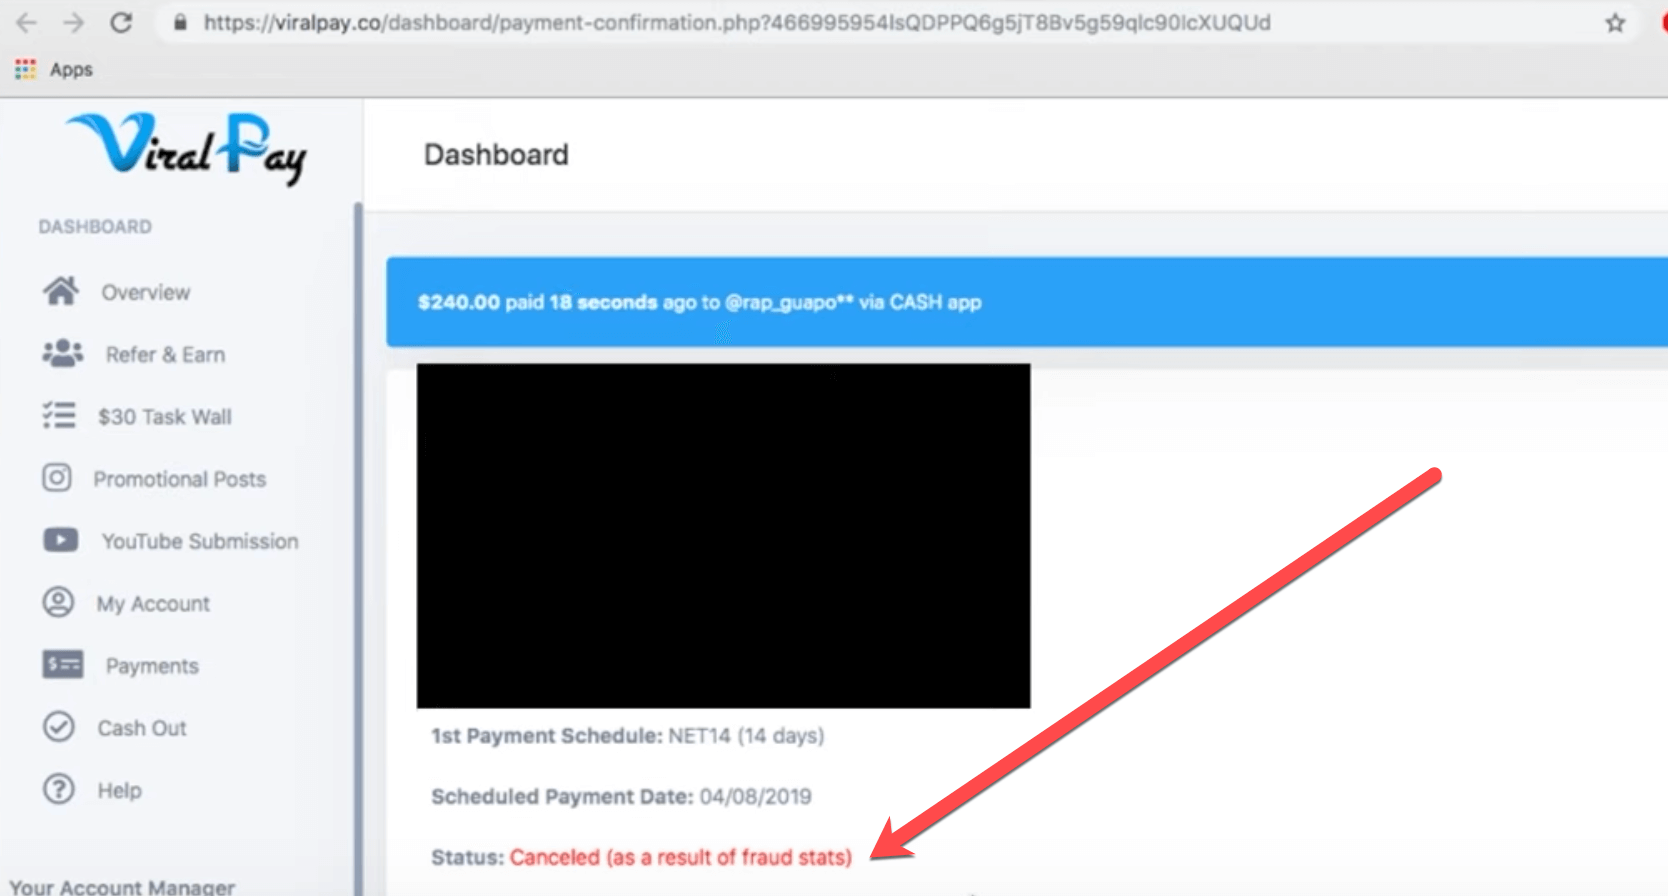 viralpay-member-account-termination